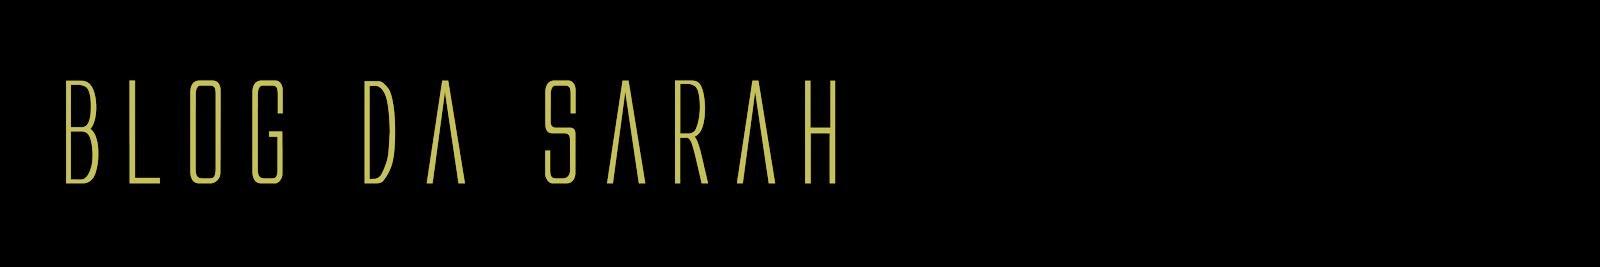 Blog da Sarah